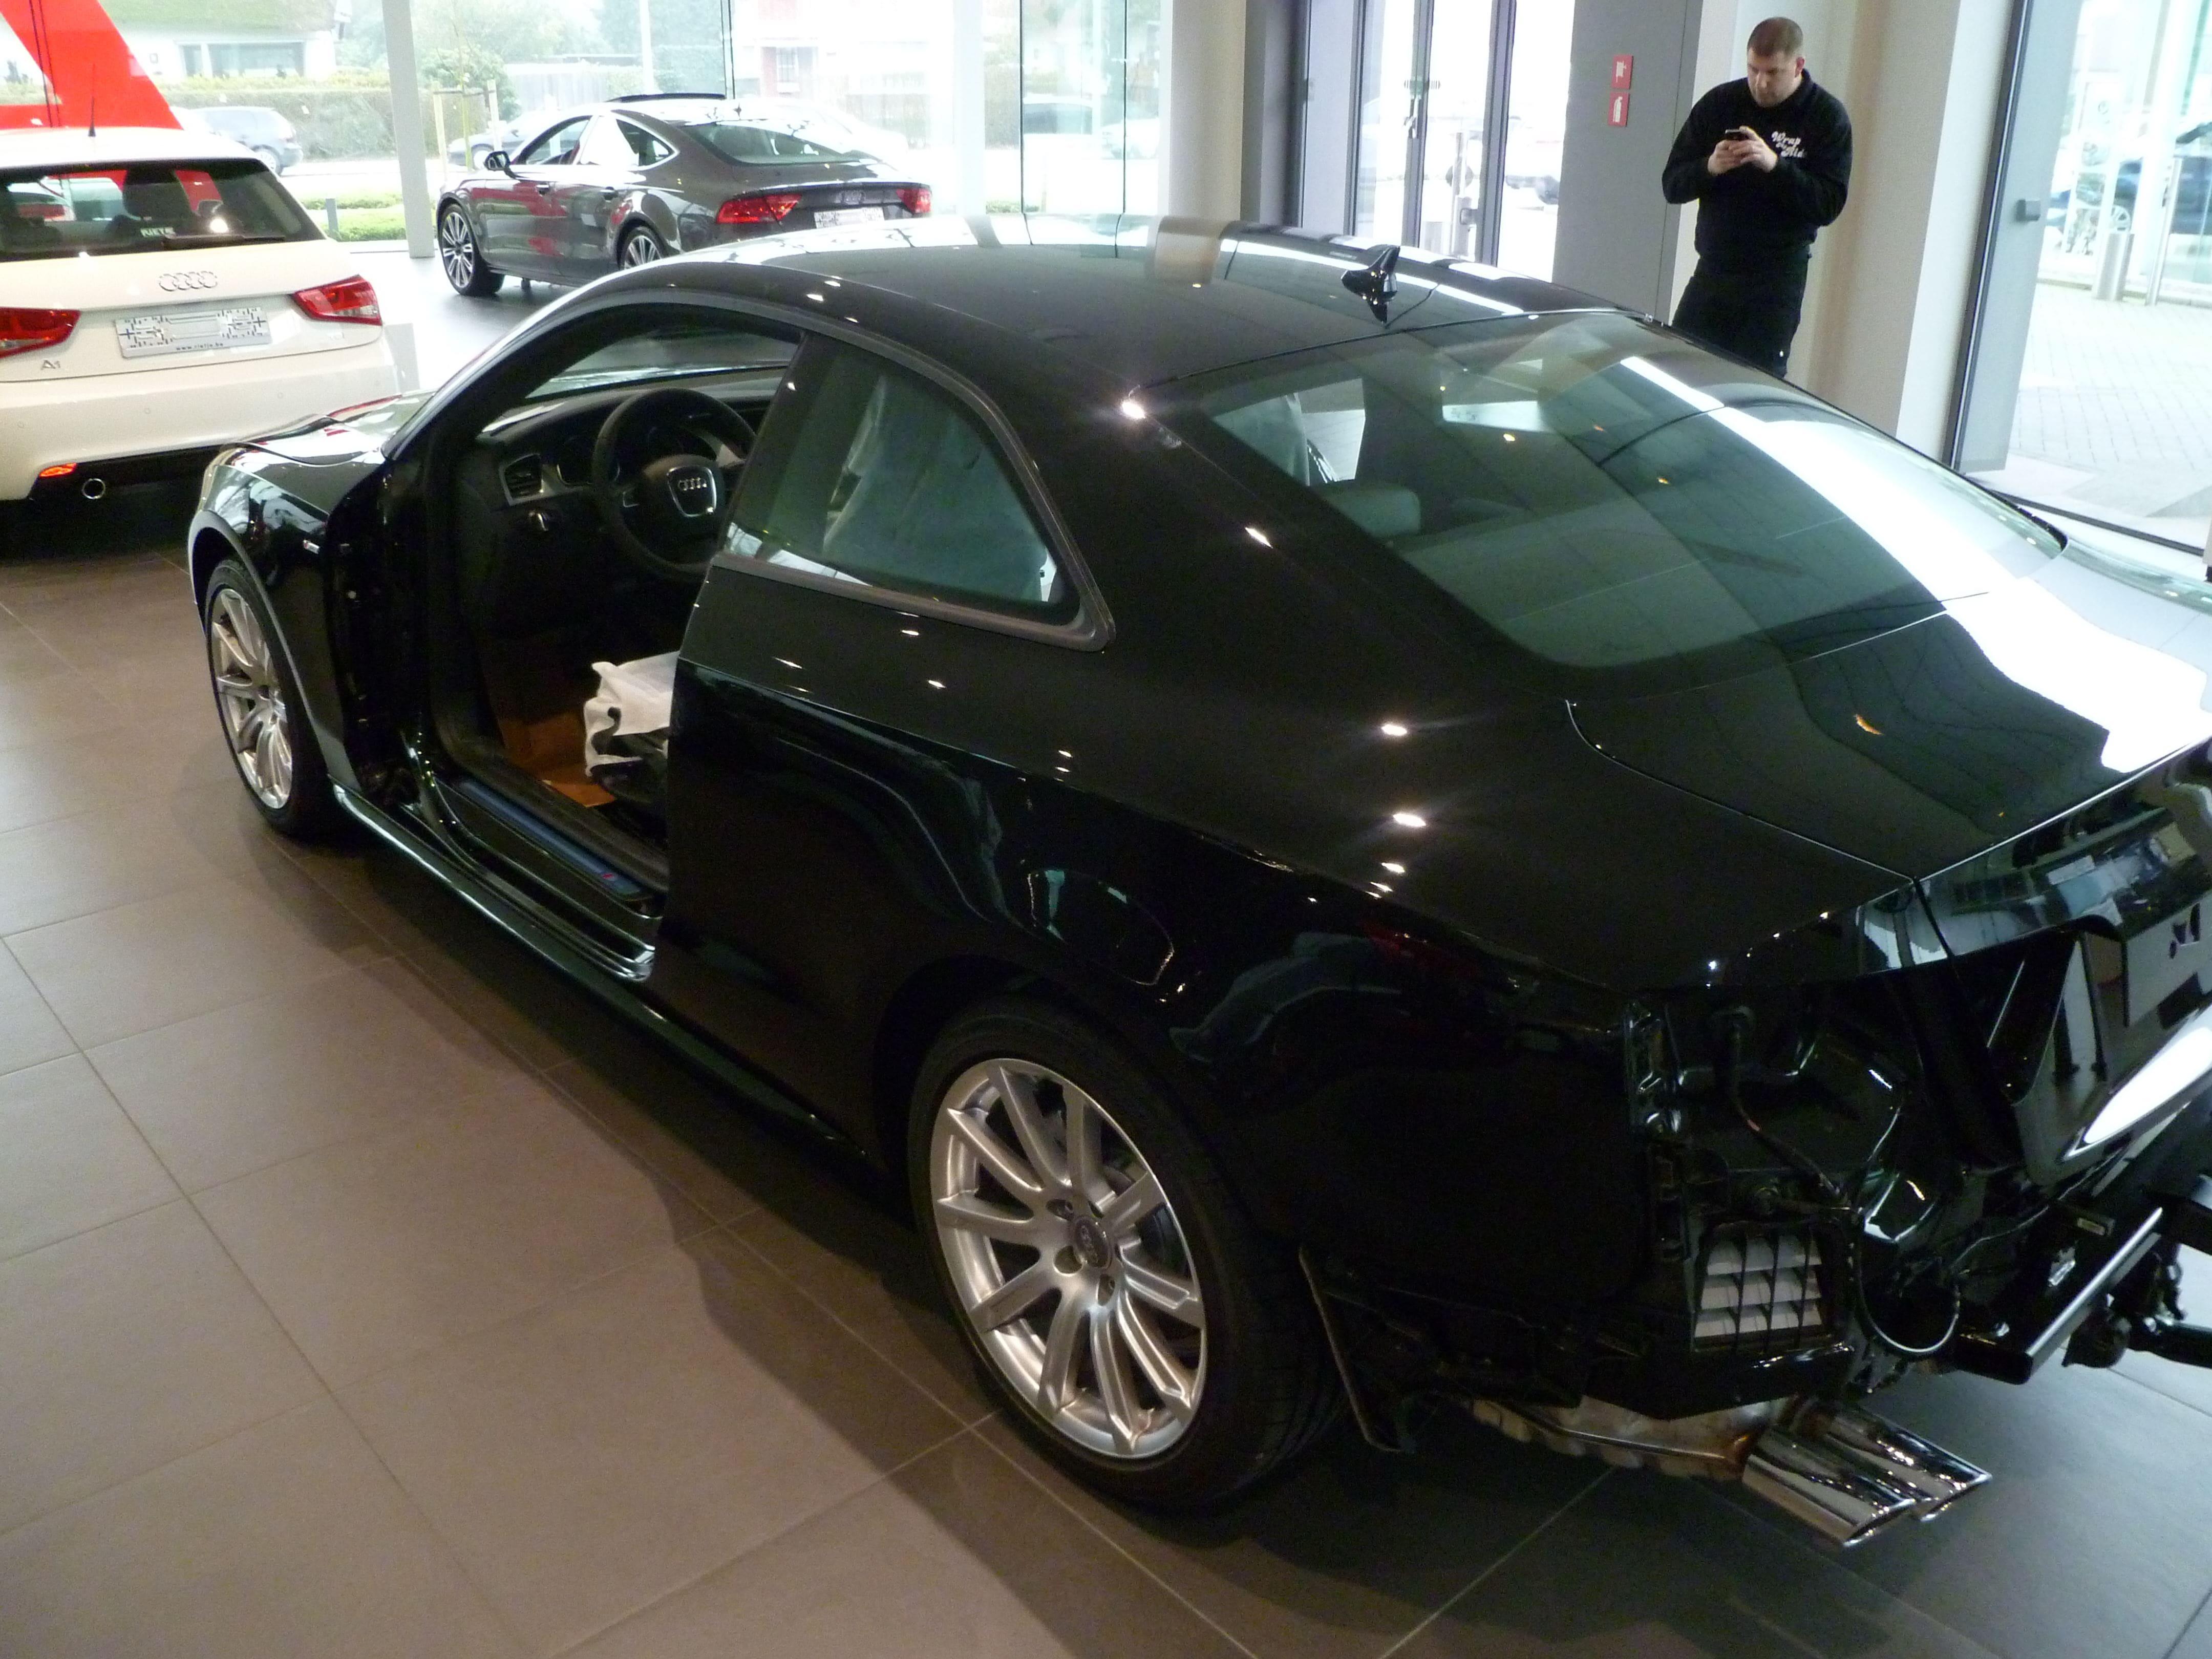 Audi A5 Coupe met Mat Zwarte Wrap, Carwrapping door Wrapmyride.nu Foto-nr:4612, ©2021